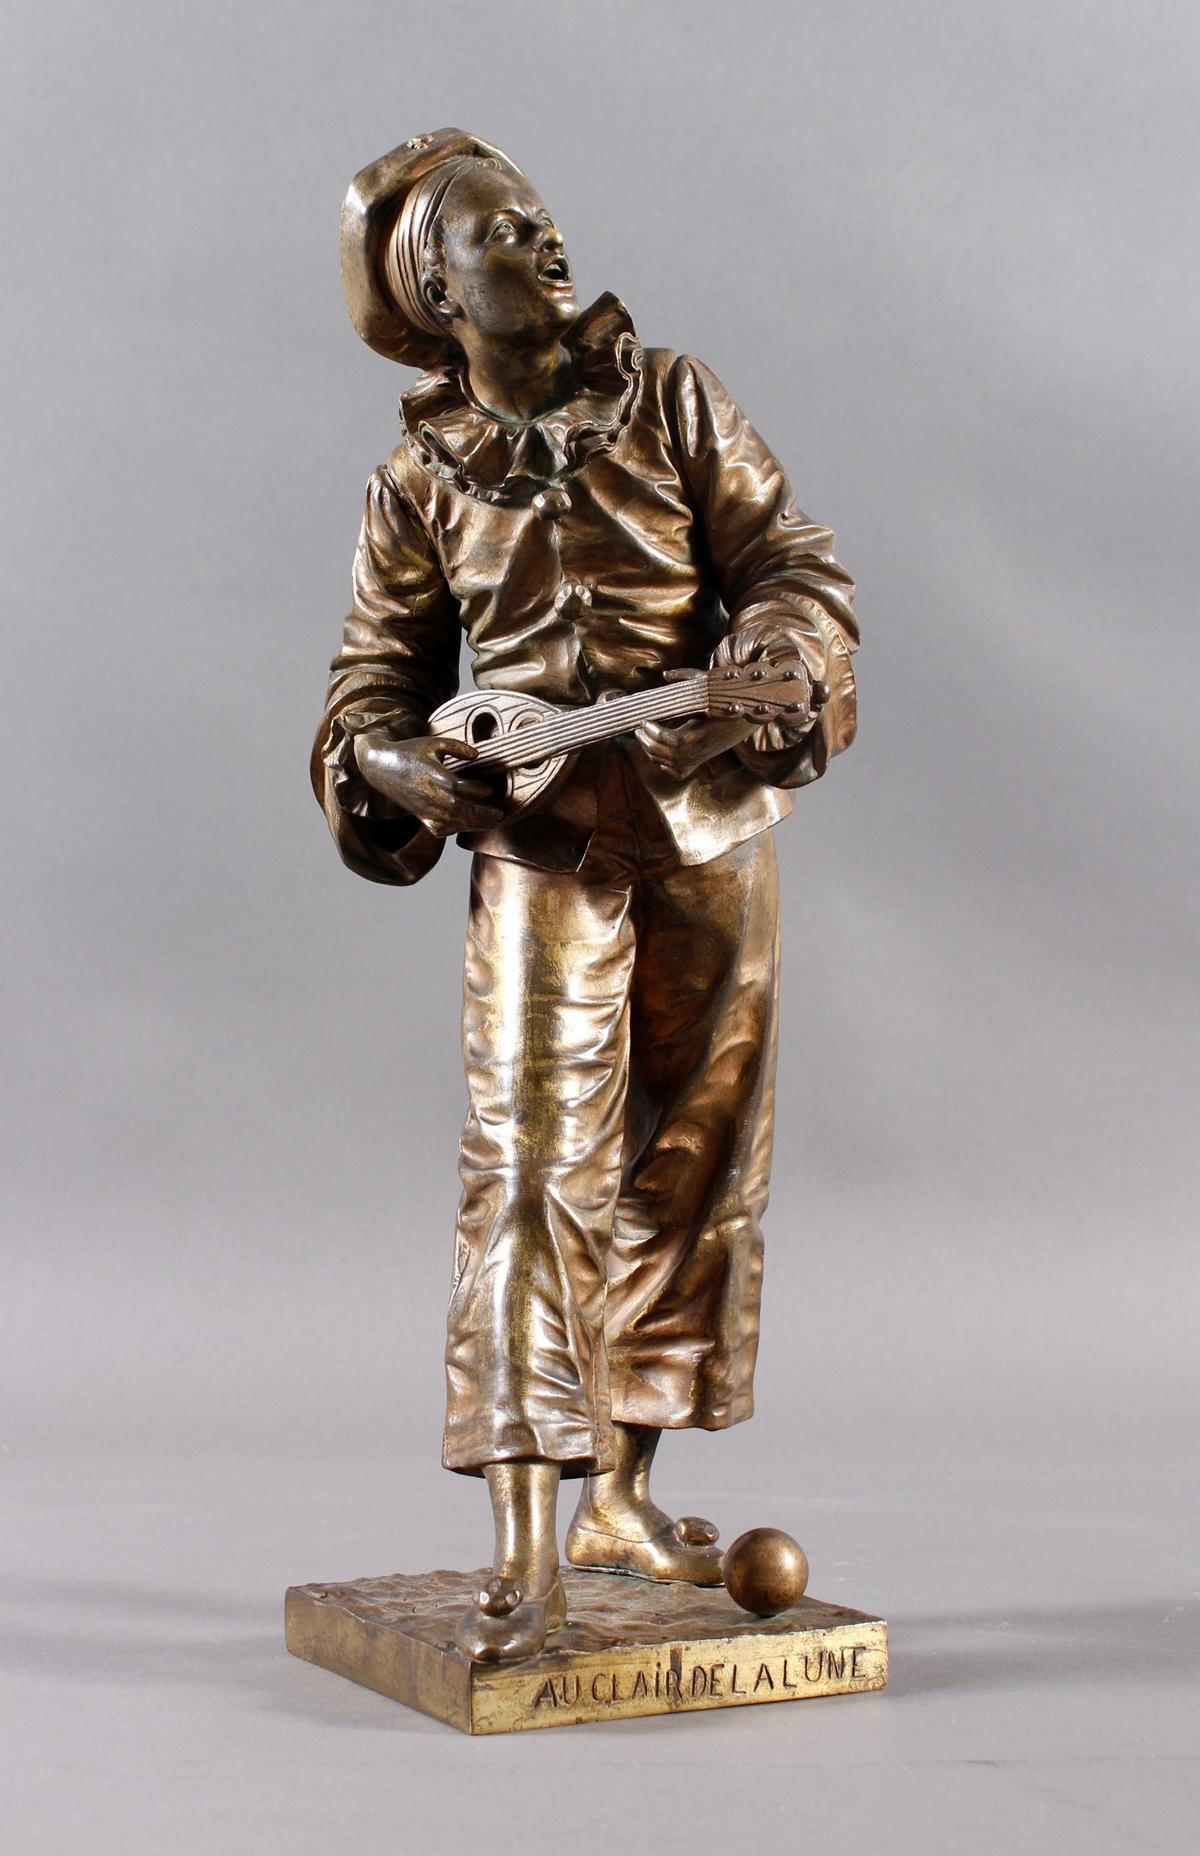 Eutrope Bouret (1833-1906), Bronzeskulptur 'Au claire de la Lune' um 1890/1900